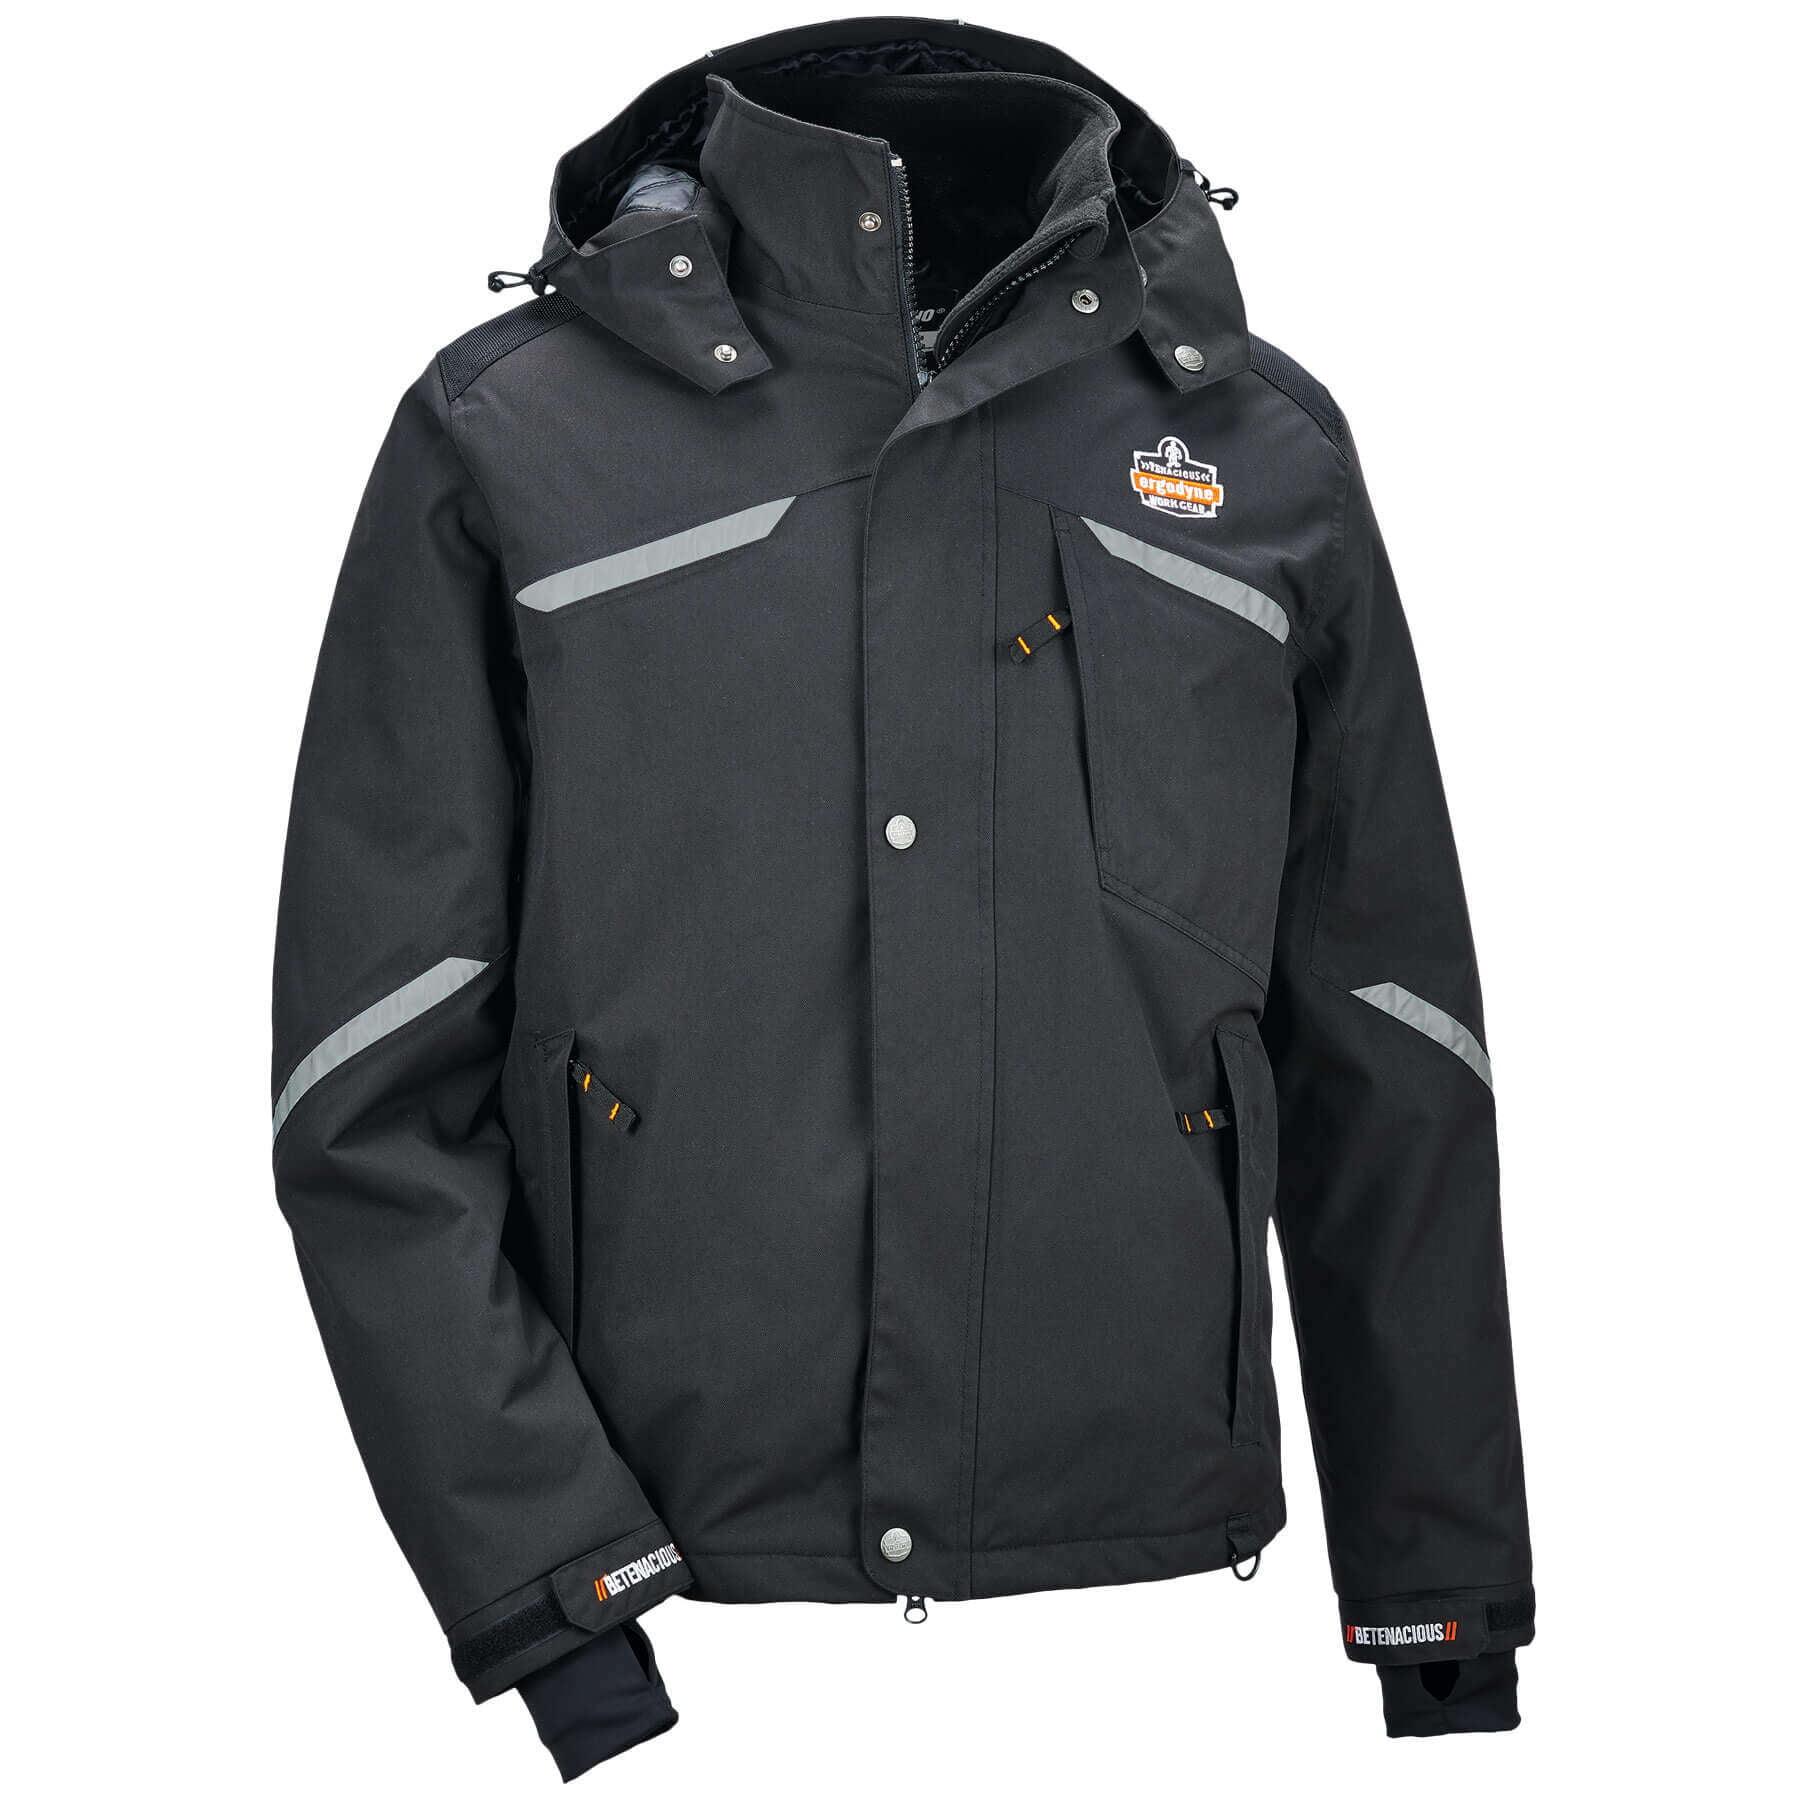 Ergodyne N-Ferno® 6466 Thermal Jacket, Black, L